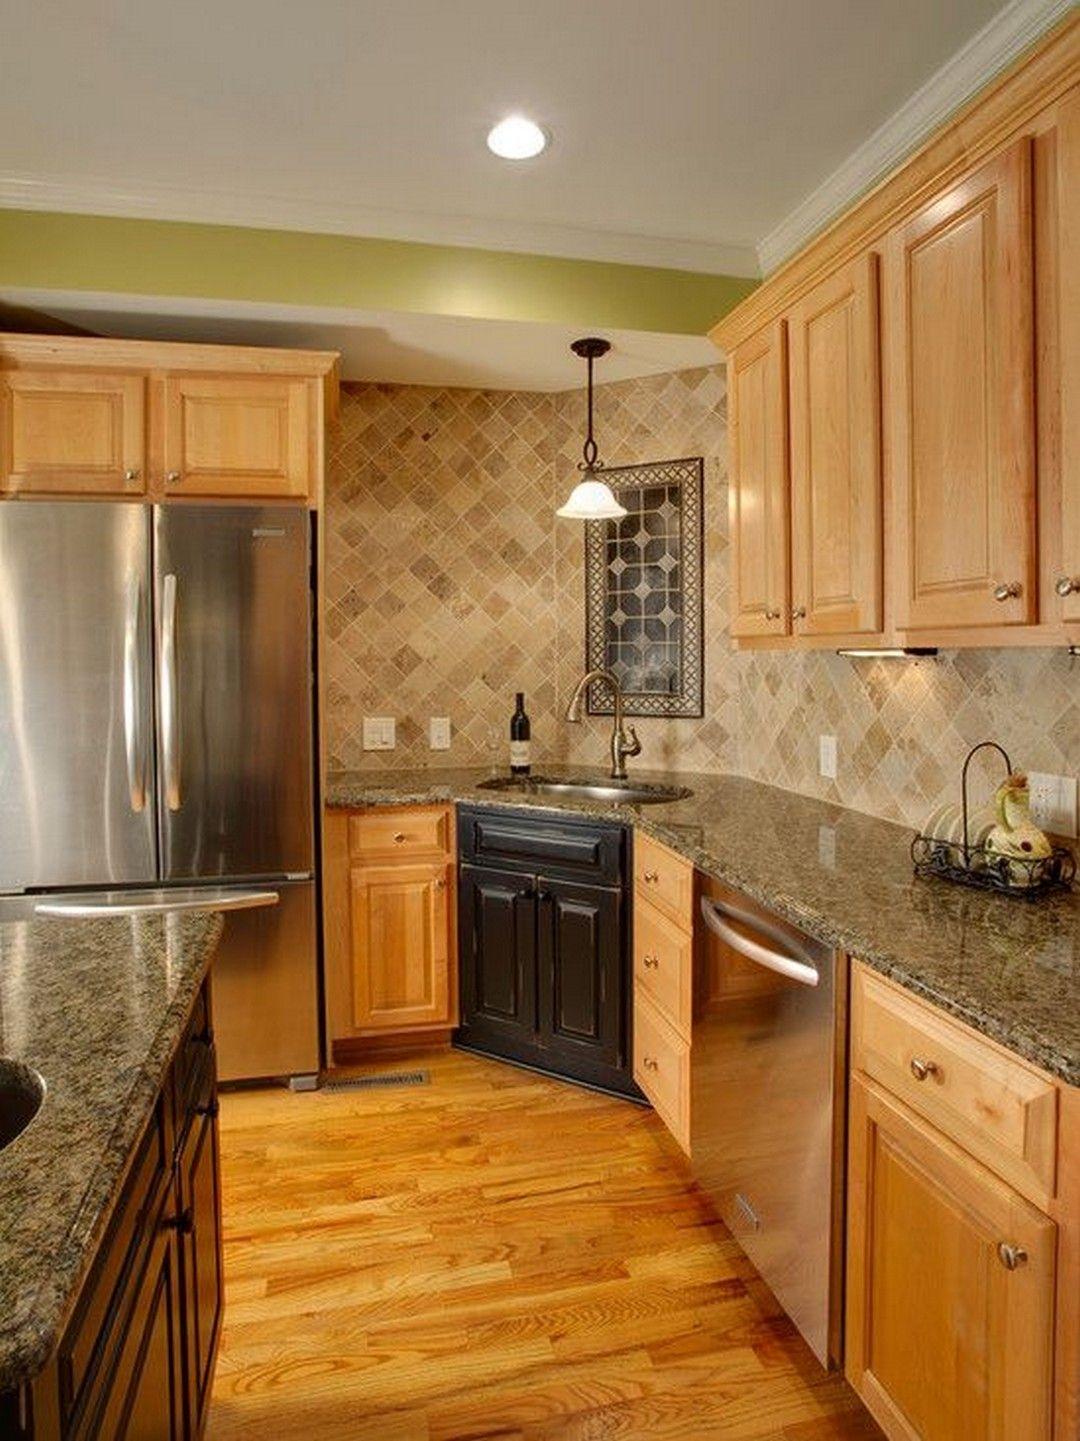 29 Fantastic Kitchen Backsplash Ideas With Oak Cabinets 11 Kitchendecorpad Cheap Kitchen Remodel Budget Kitchen Remodel Kitchen Remodel Layout